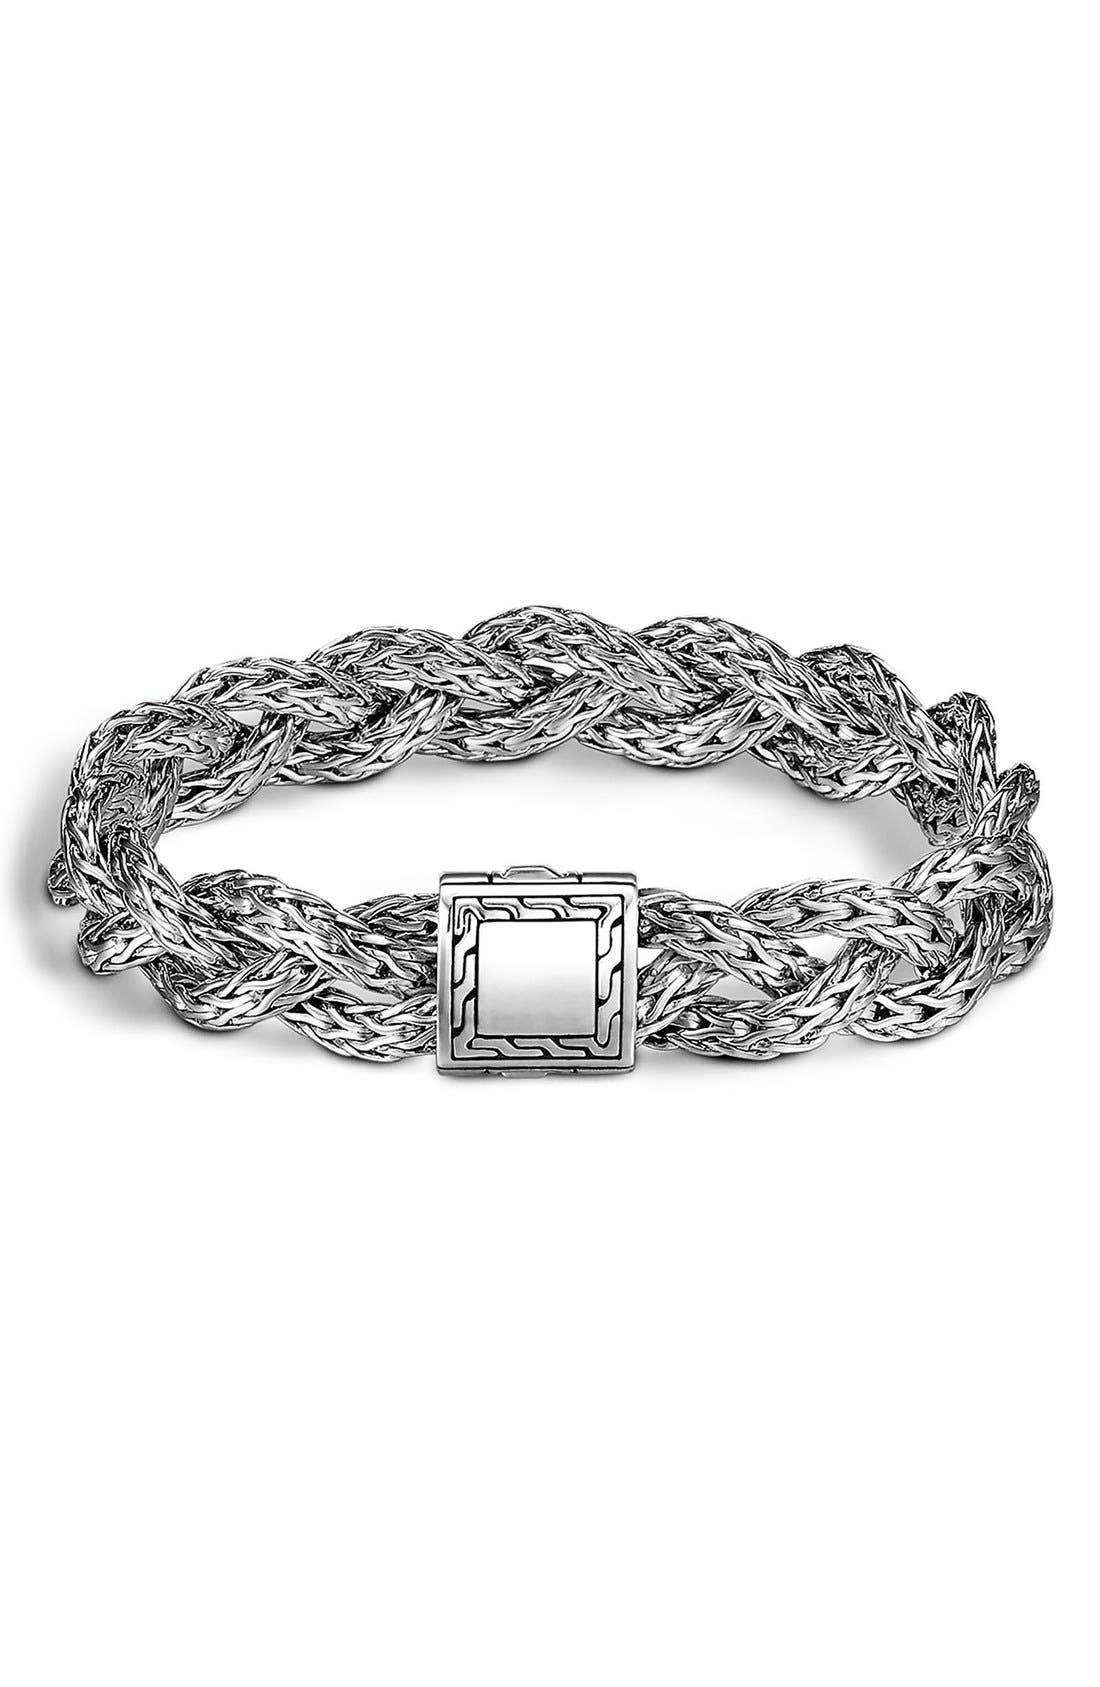 Alternate Image 1 Selected - John Hardy 'Classic Chain' Small Braided Bracelet